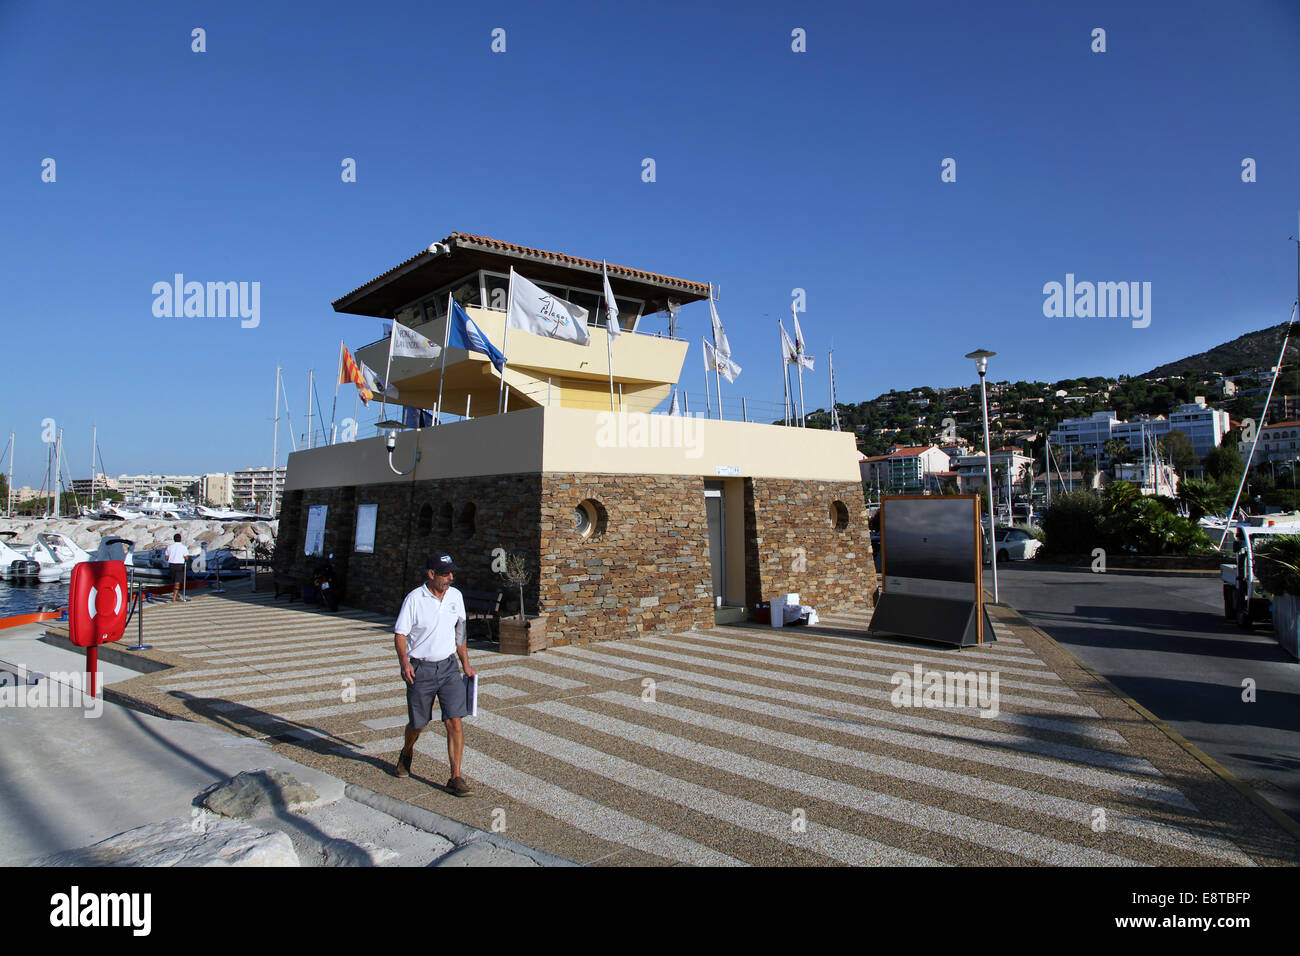 harbourmaster harbormaster in the port of Le Lavandou.cote d'azur.france. - Stock Image